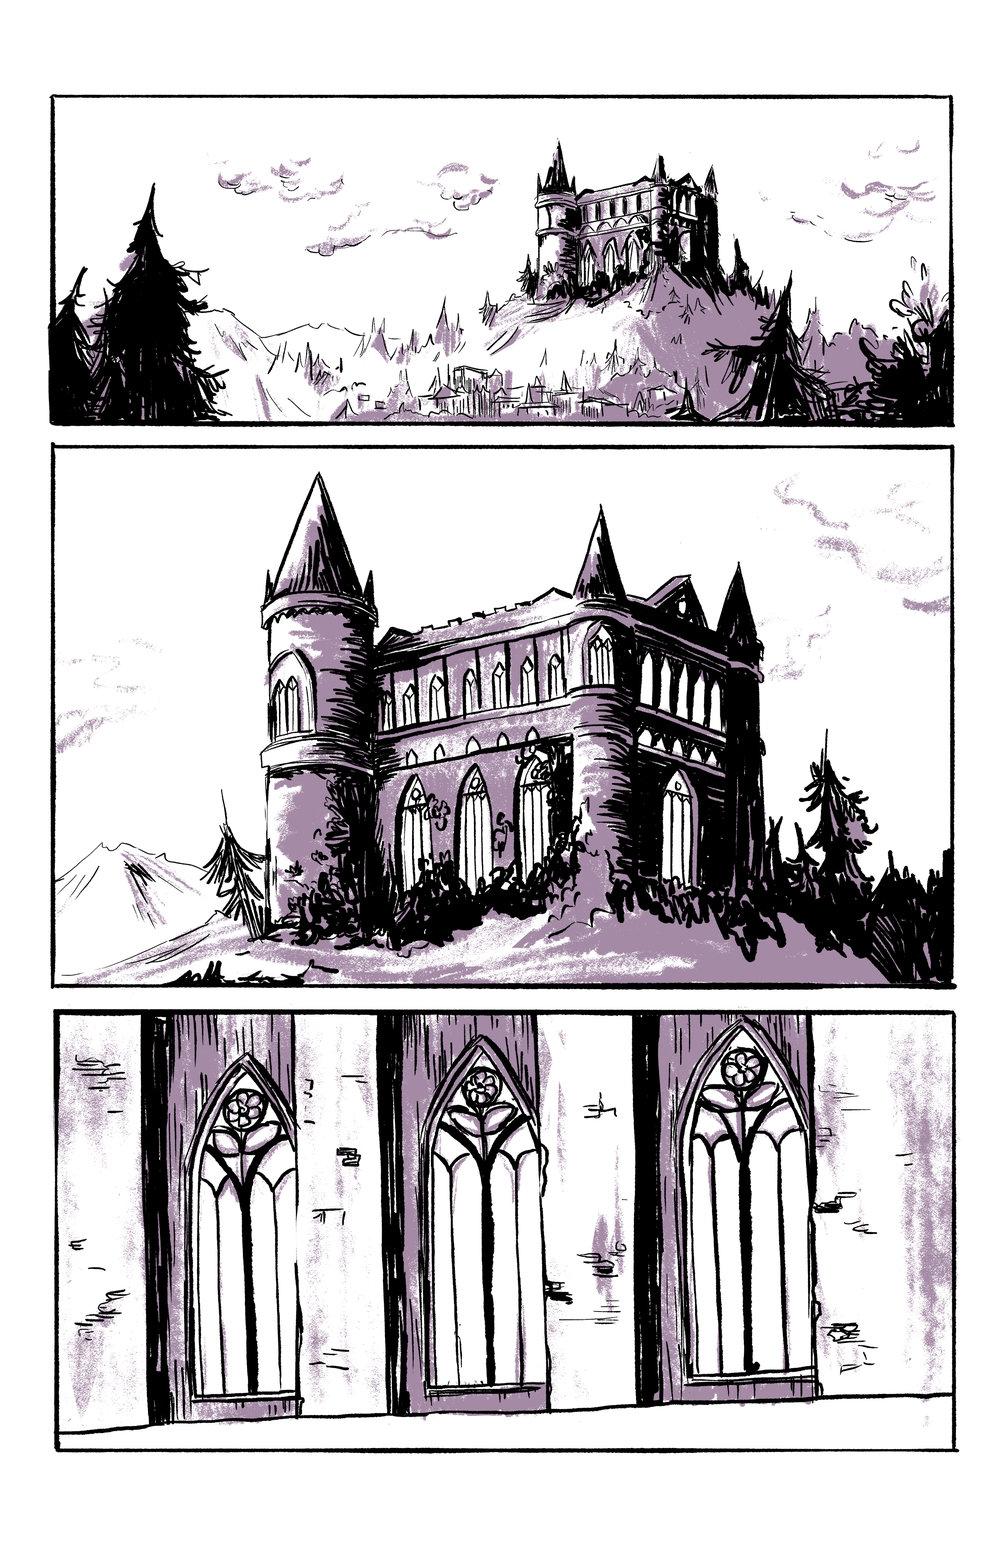 Comic page 1 final.jpg